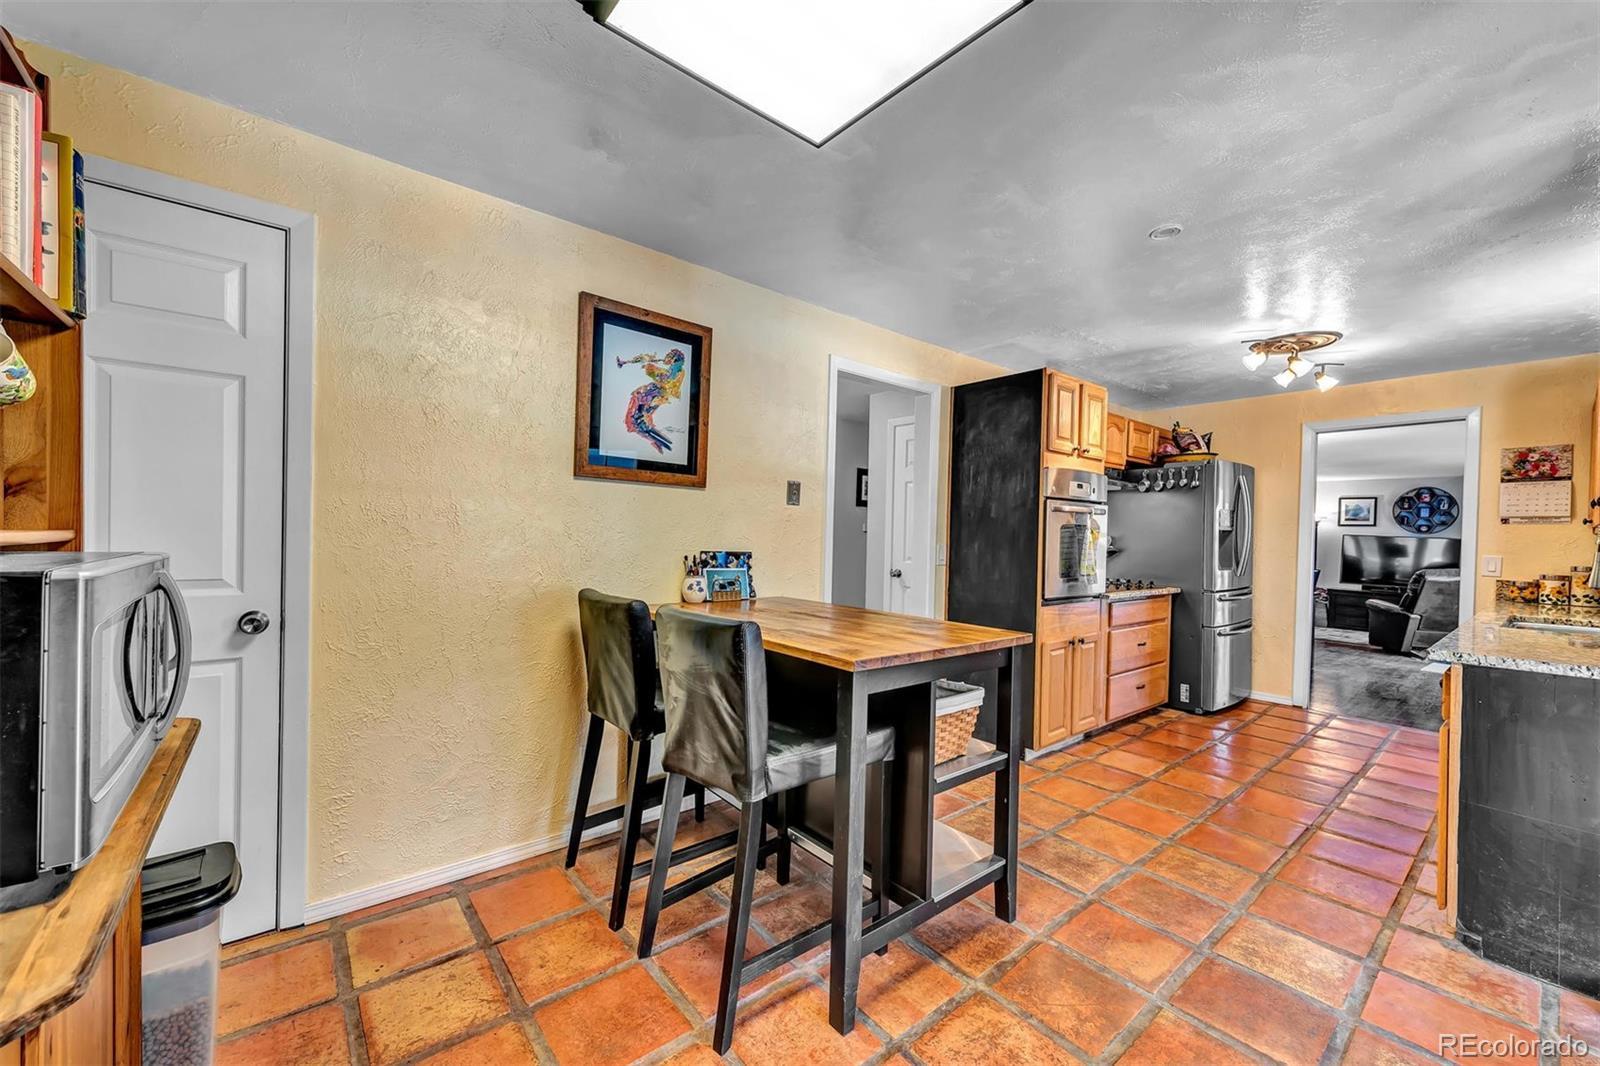 MLS# 2637392 - 11 - 3094 S Gray Street, Lakewood, CO 80227